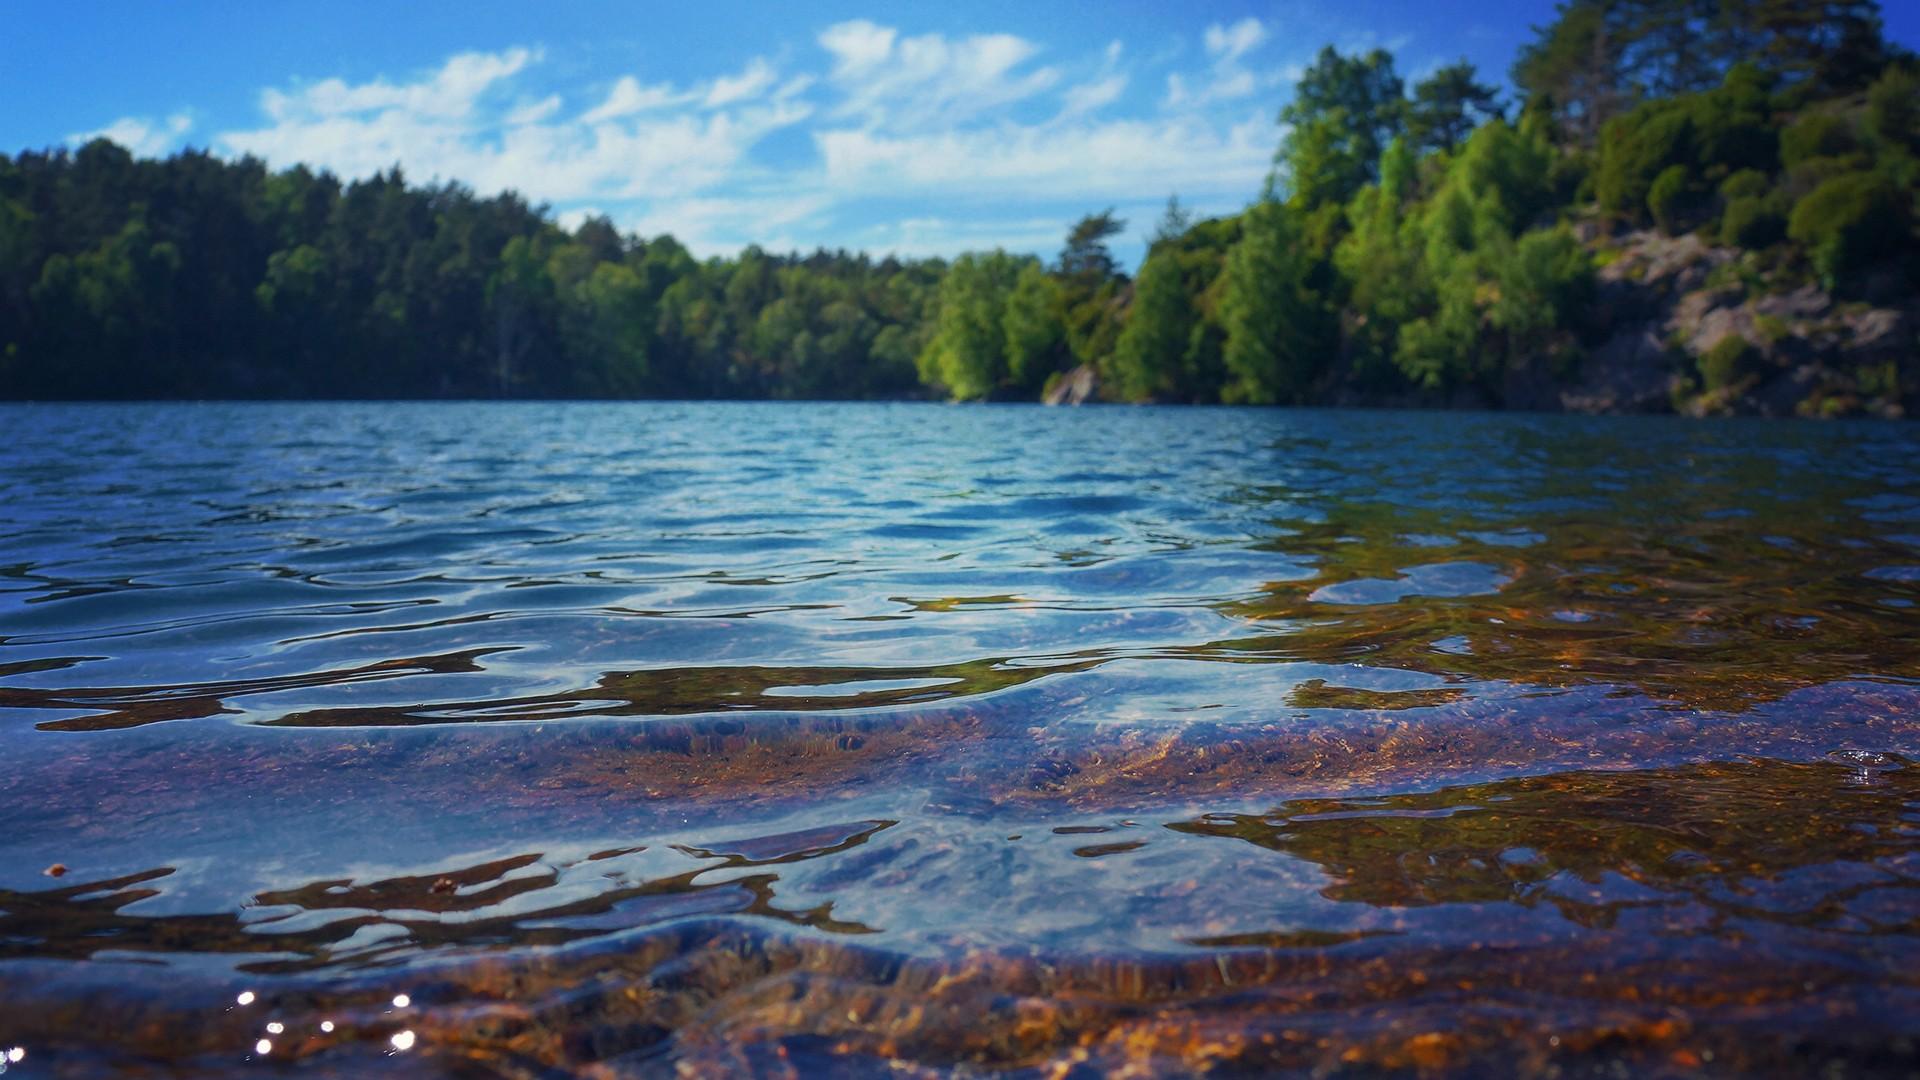 озеро лес река берег картинки